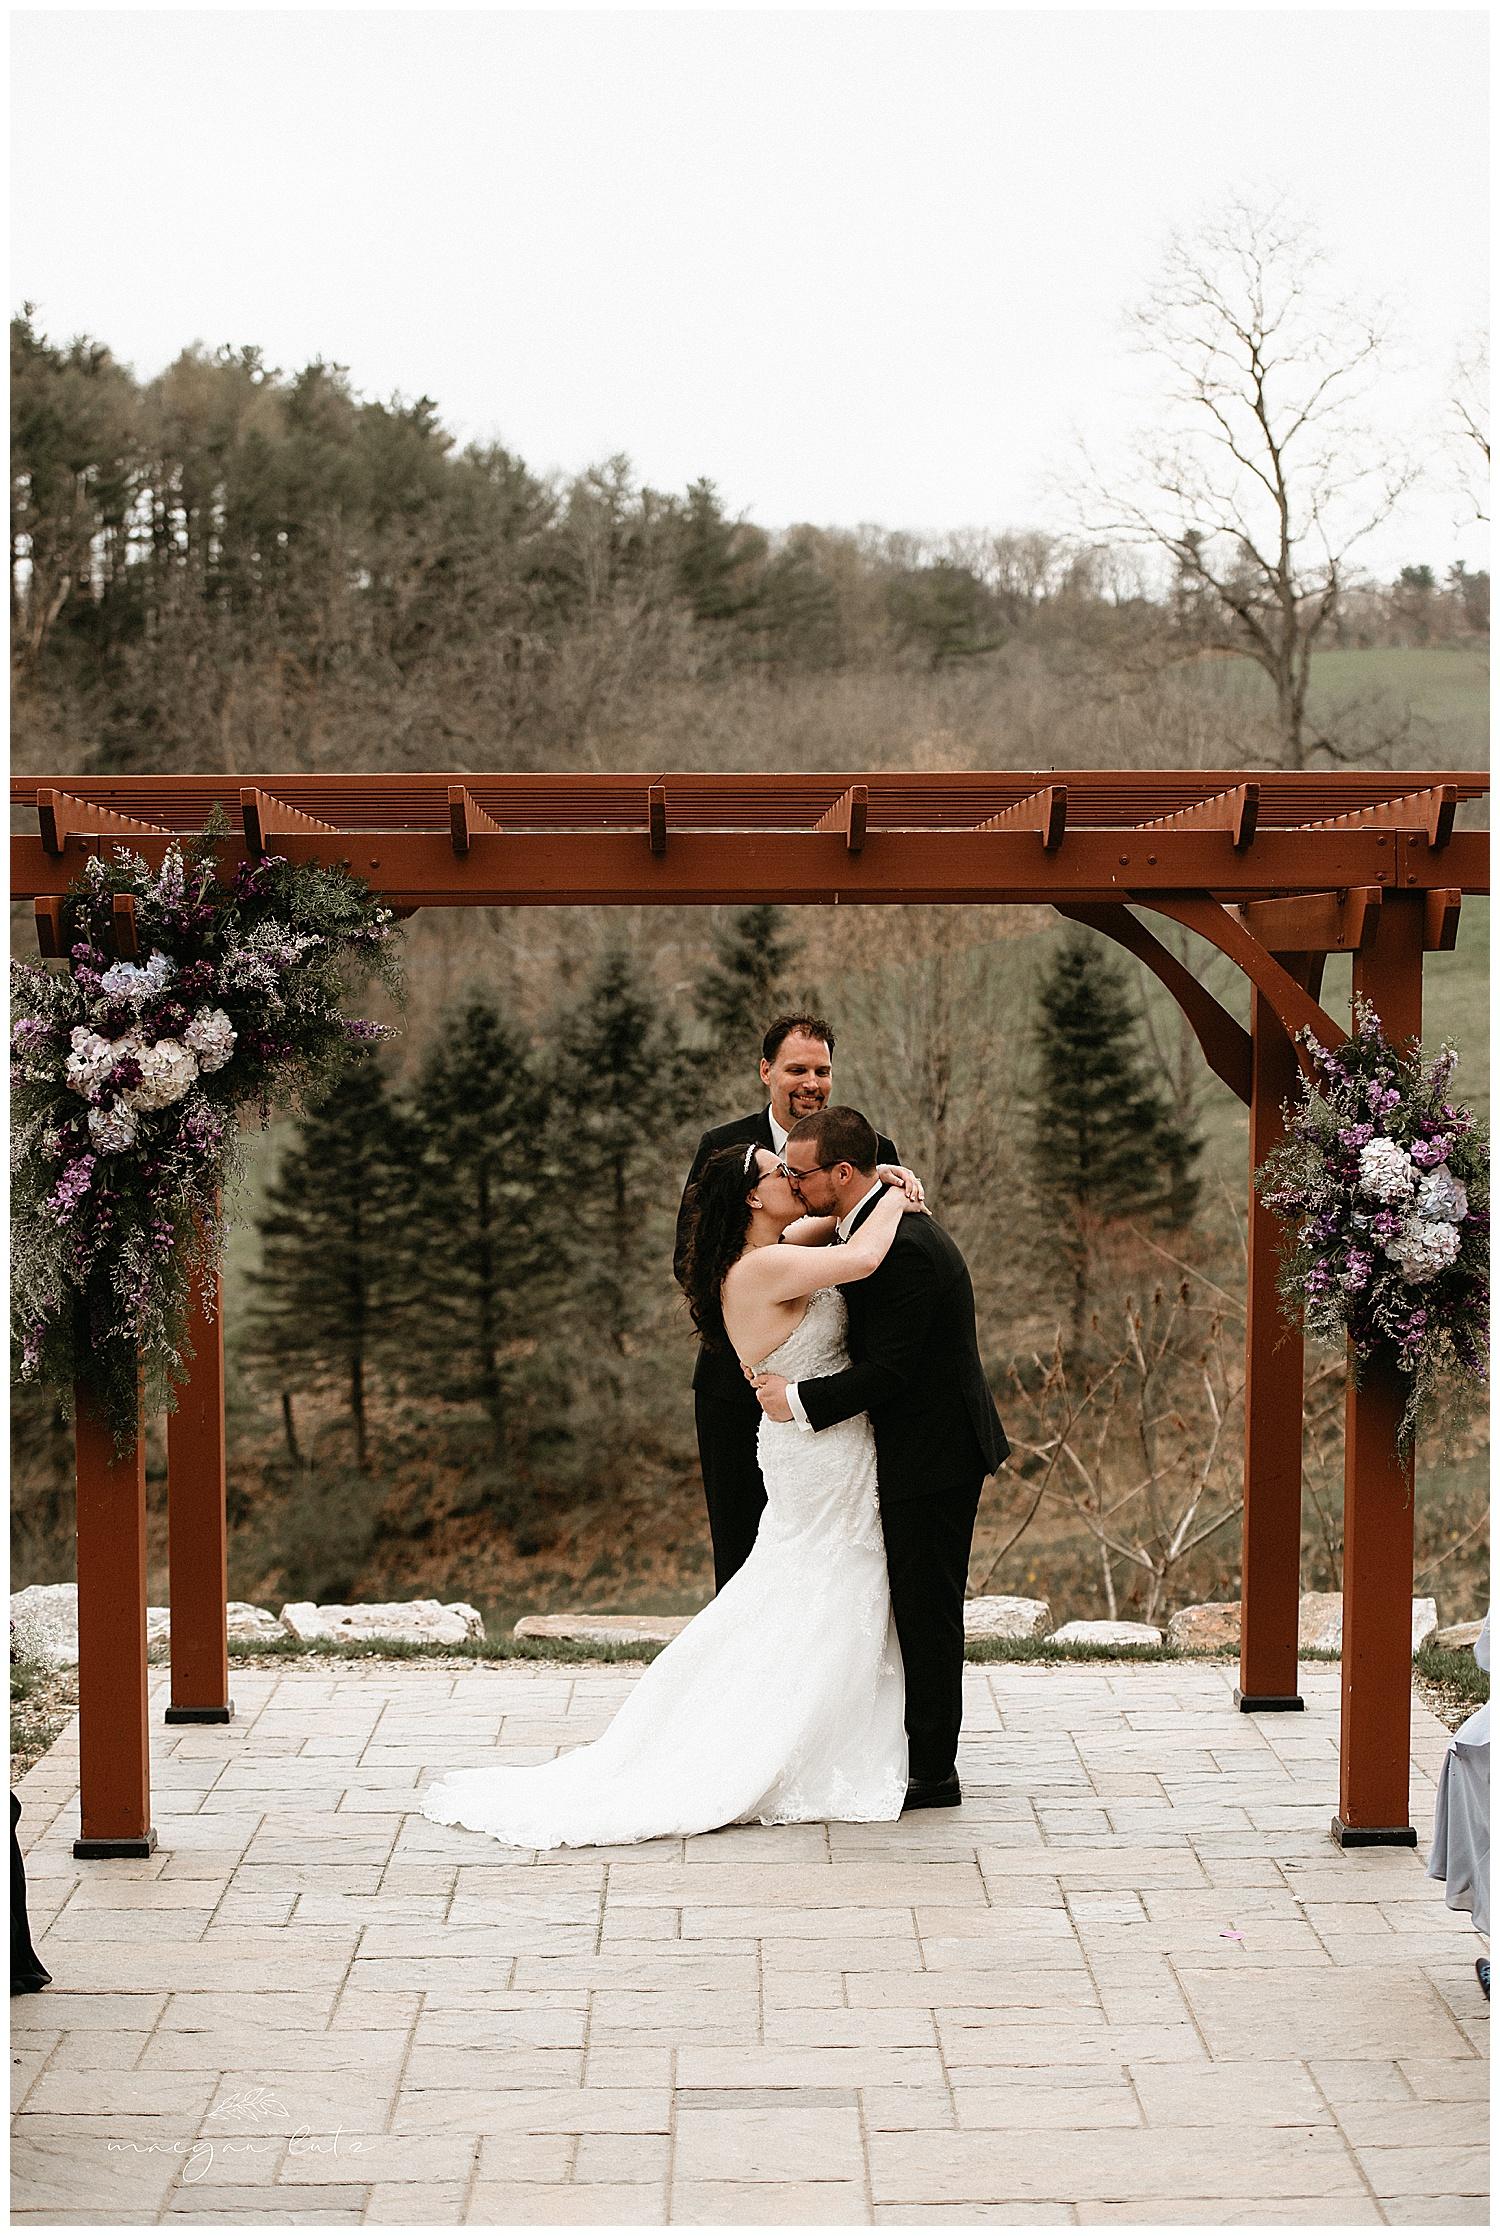 NEPA-wedding-photographer-at-the-glasbern-inn-fogelsvilles-pa_0018.jpg